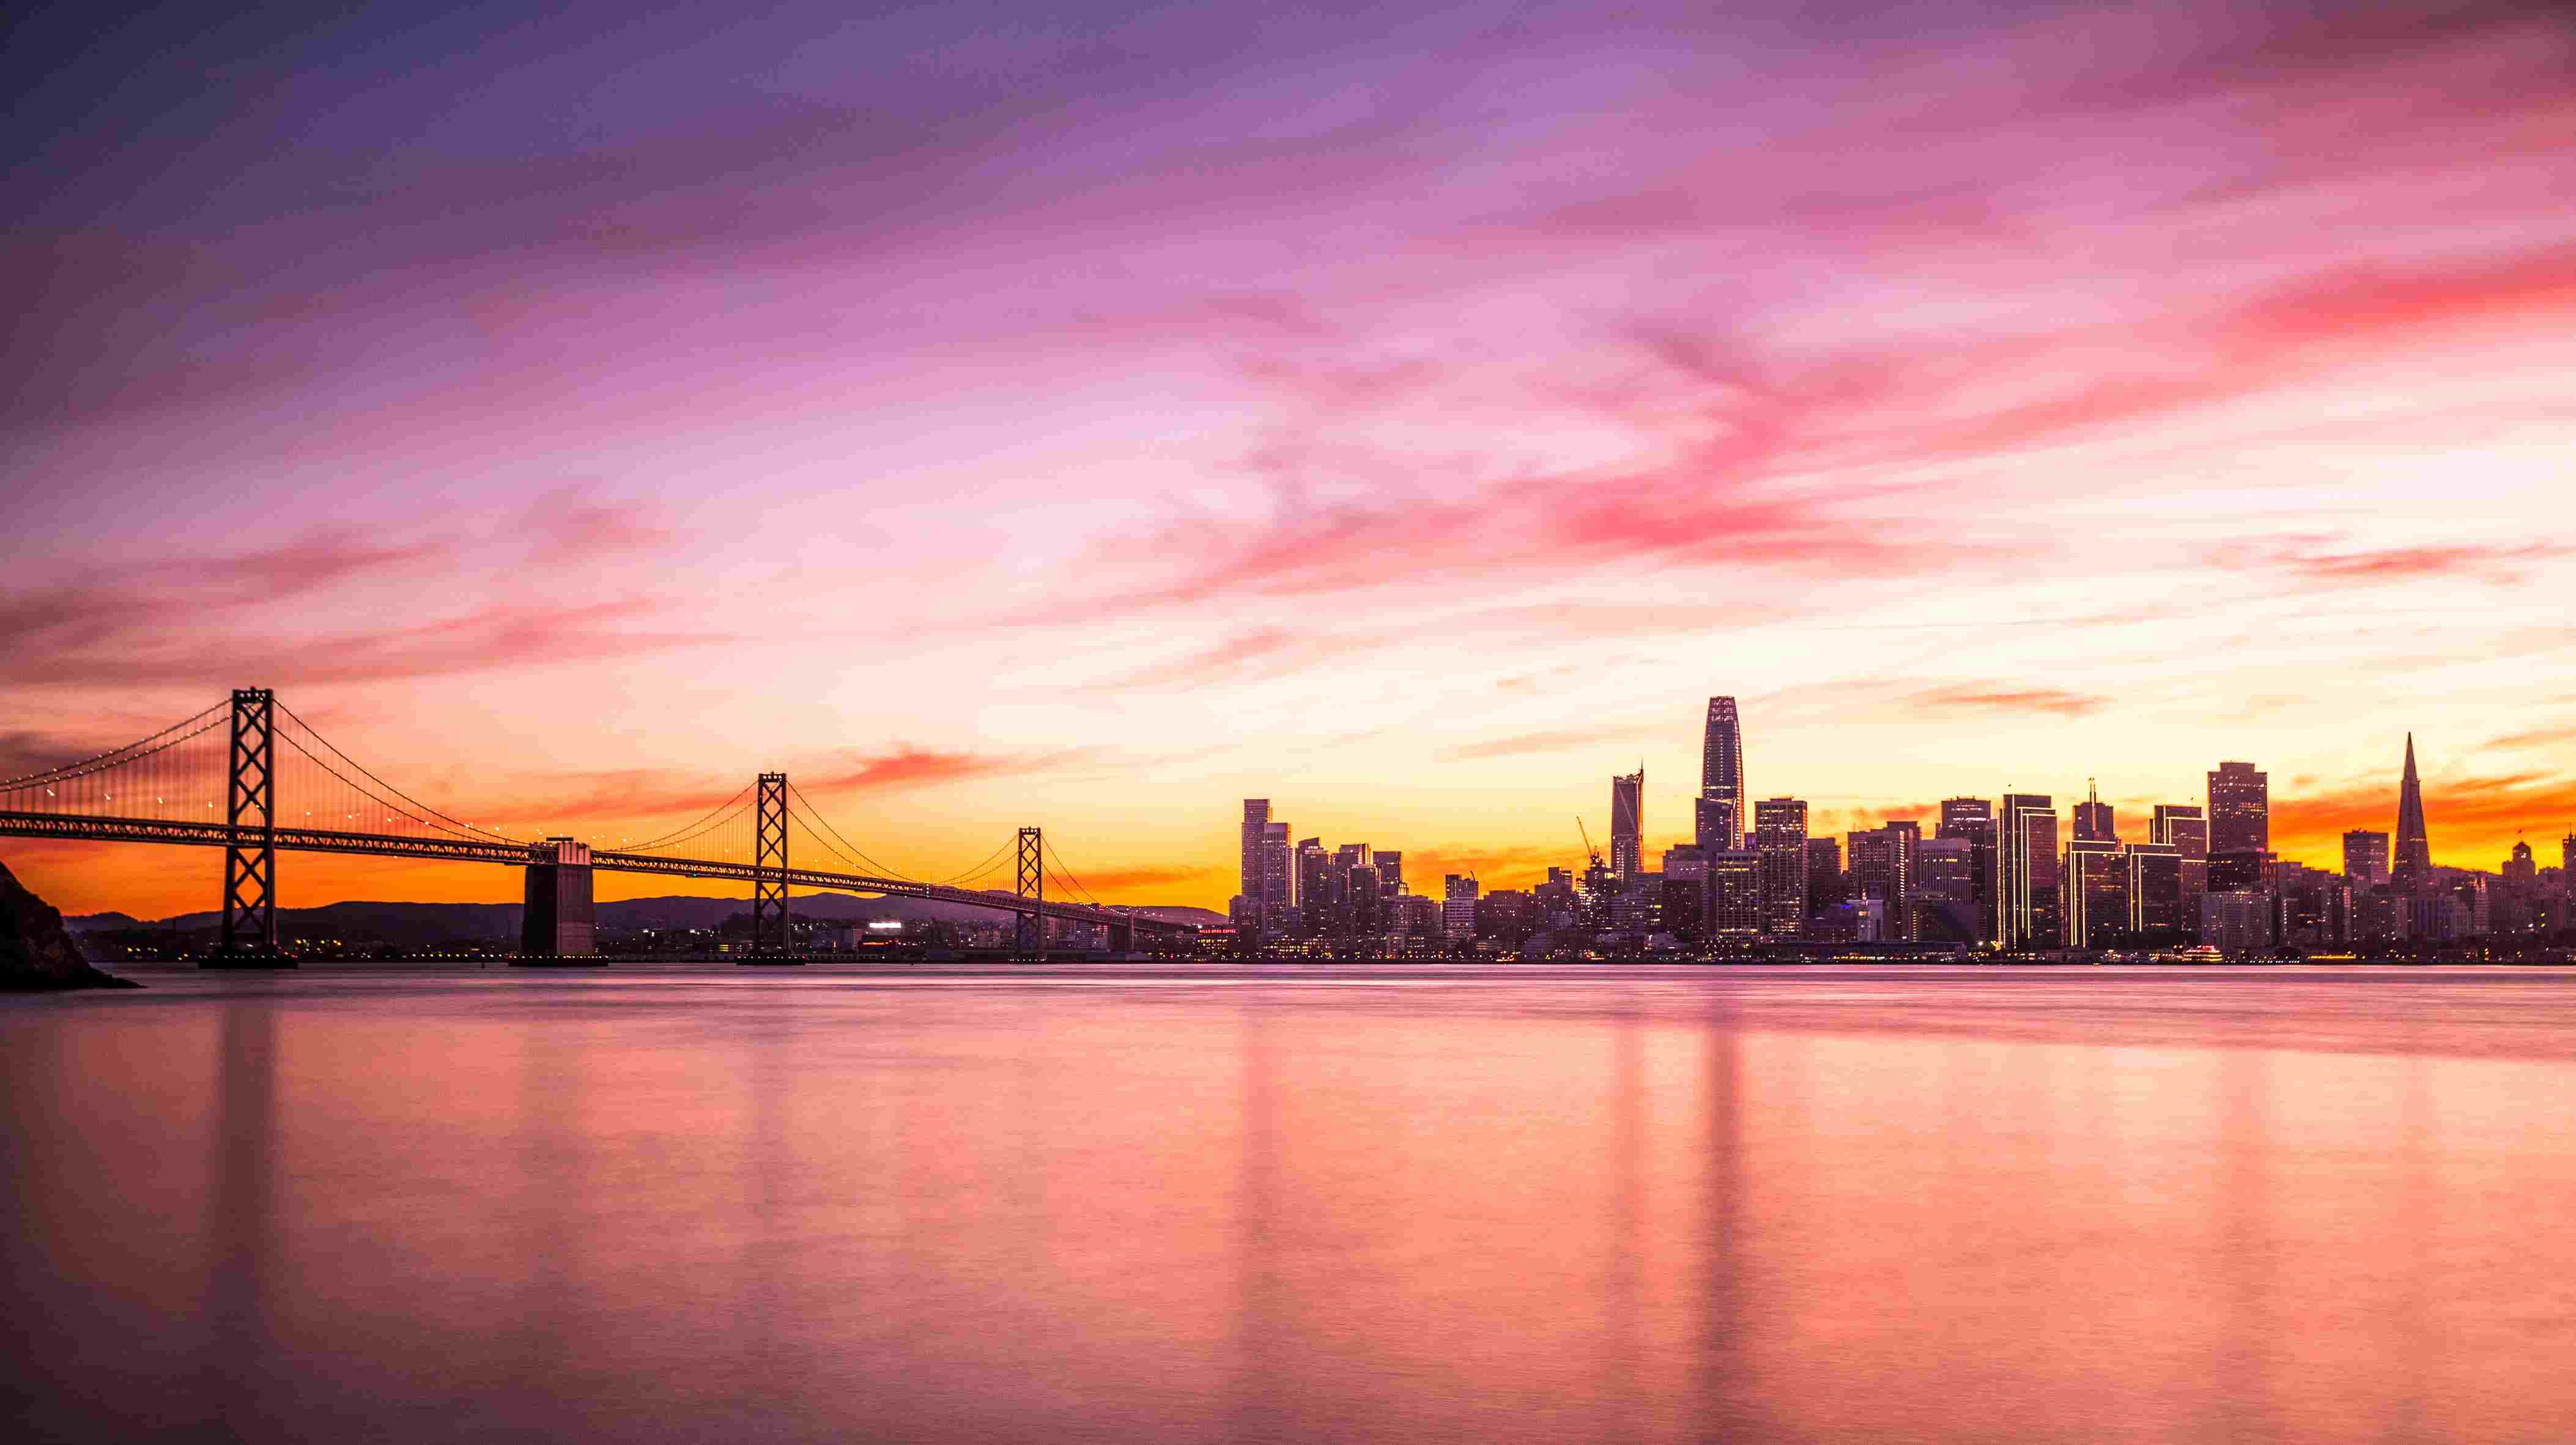 Modern futuristic downtown San Francisco skyline at night